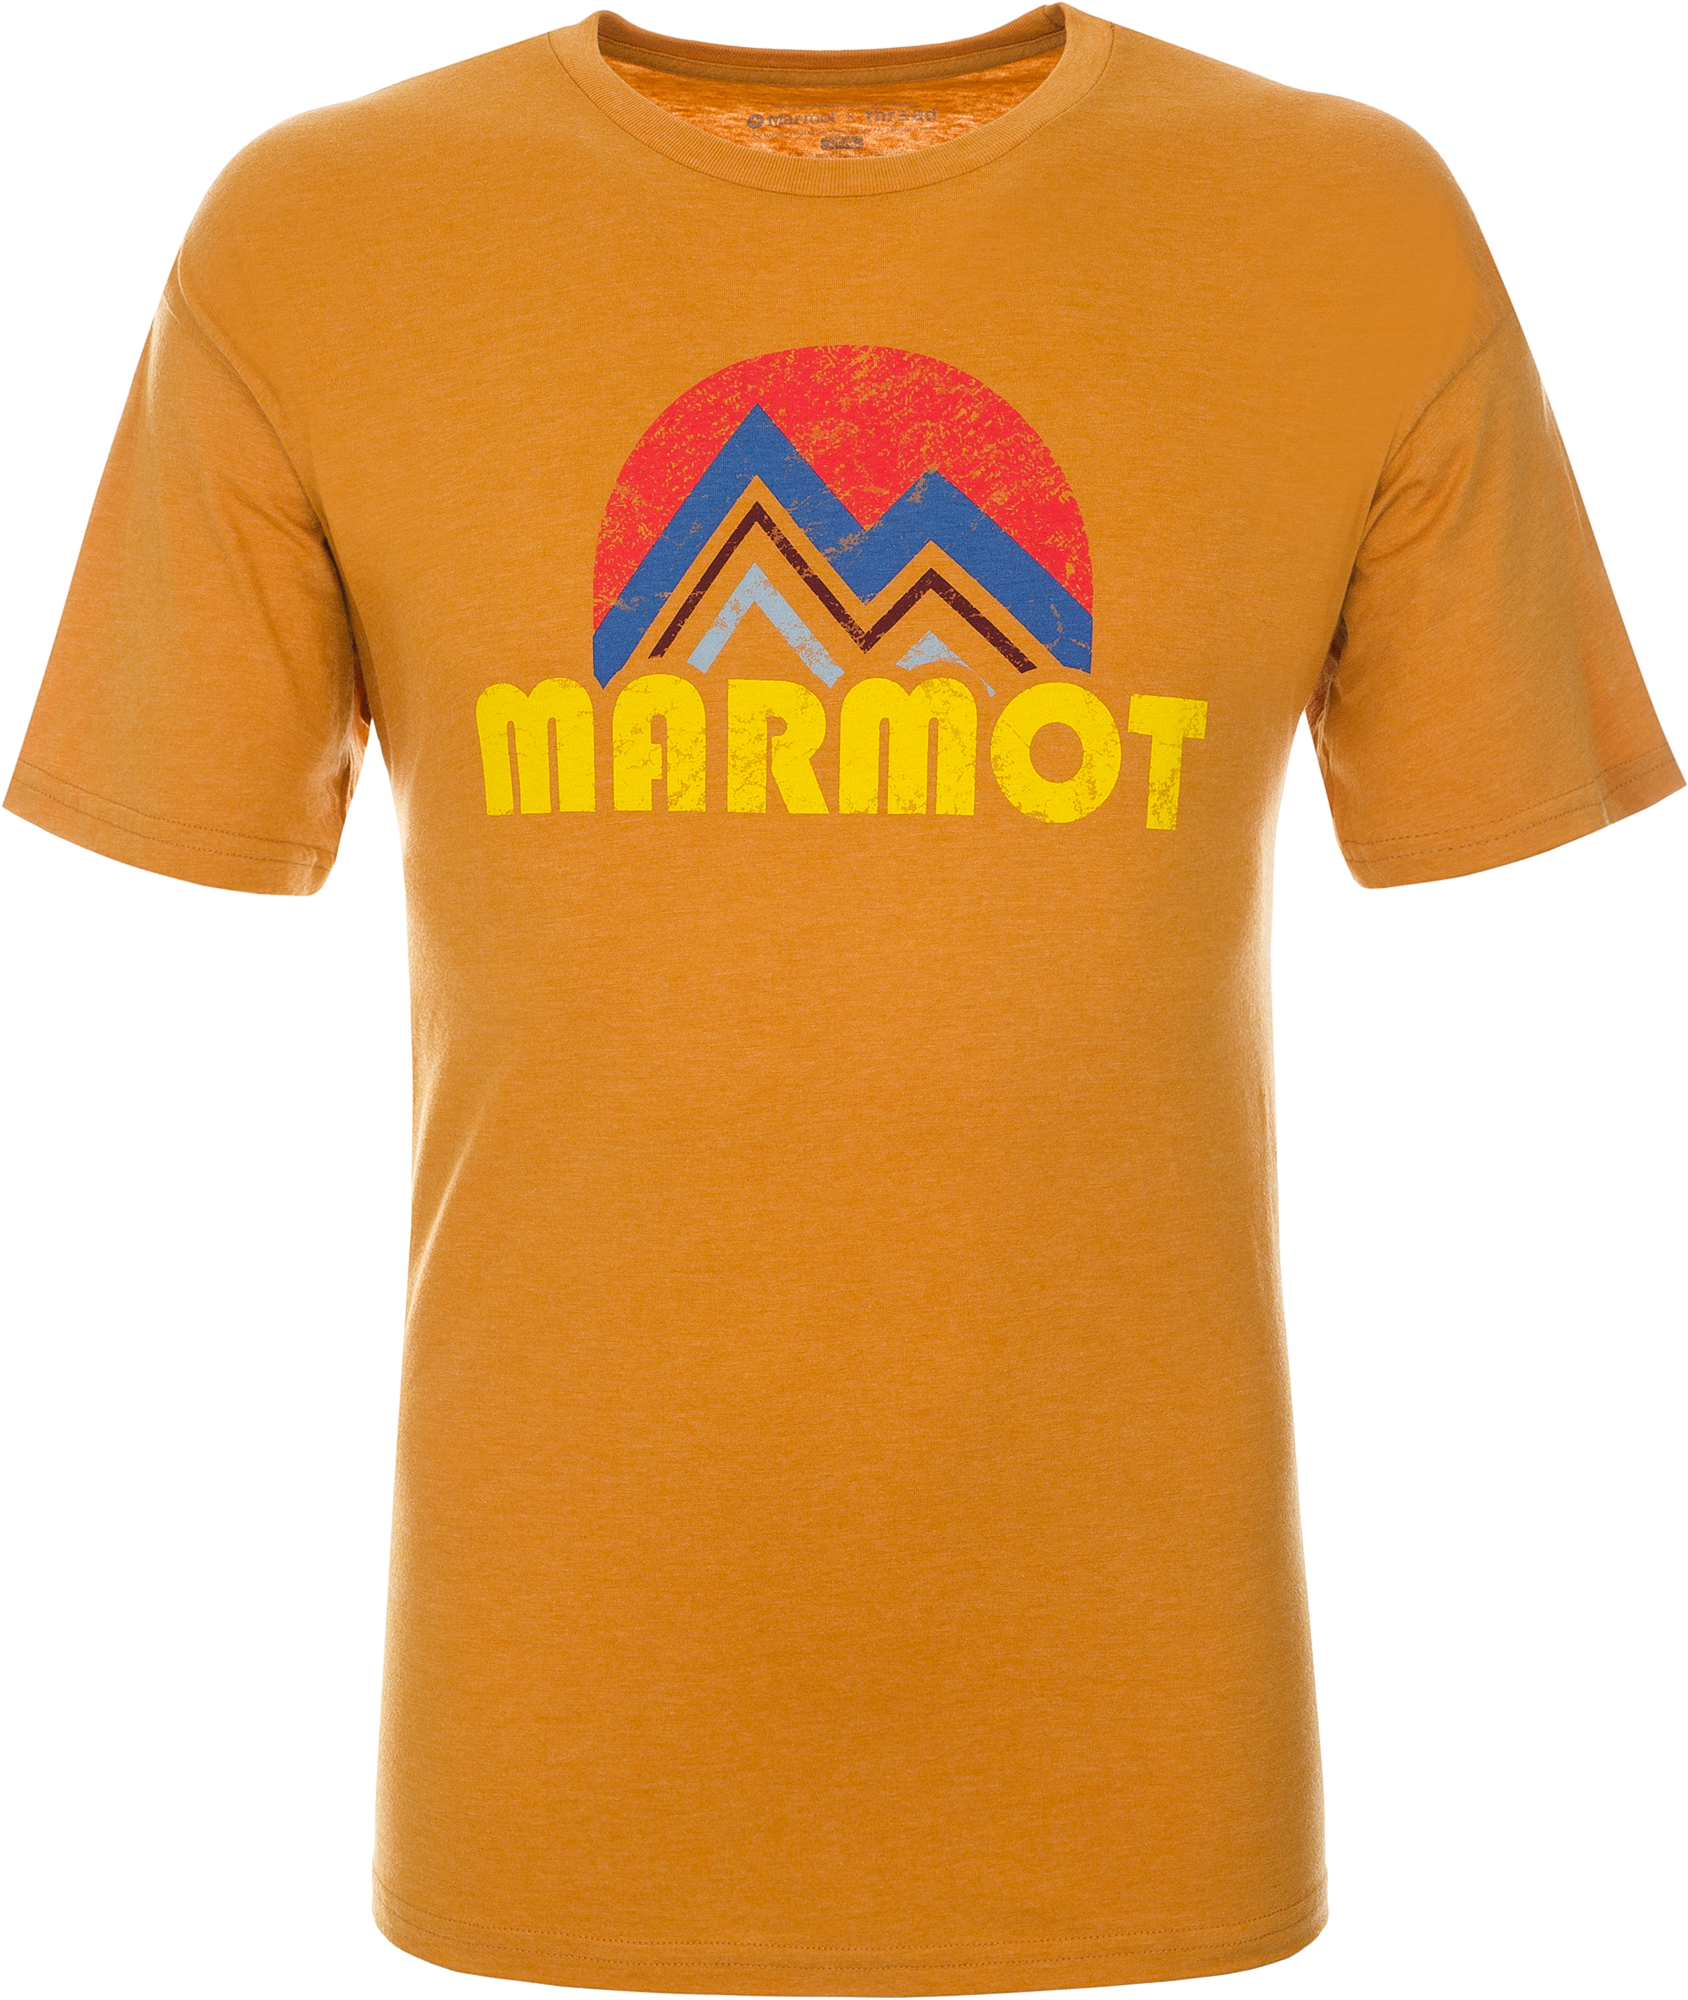 Marmot Футболка мужская Marmot, размер 58-60 футболка мужская reebok f striped tee цвет серый bk3324 размер xl 56 58